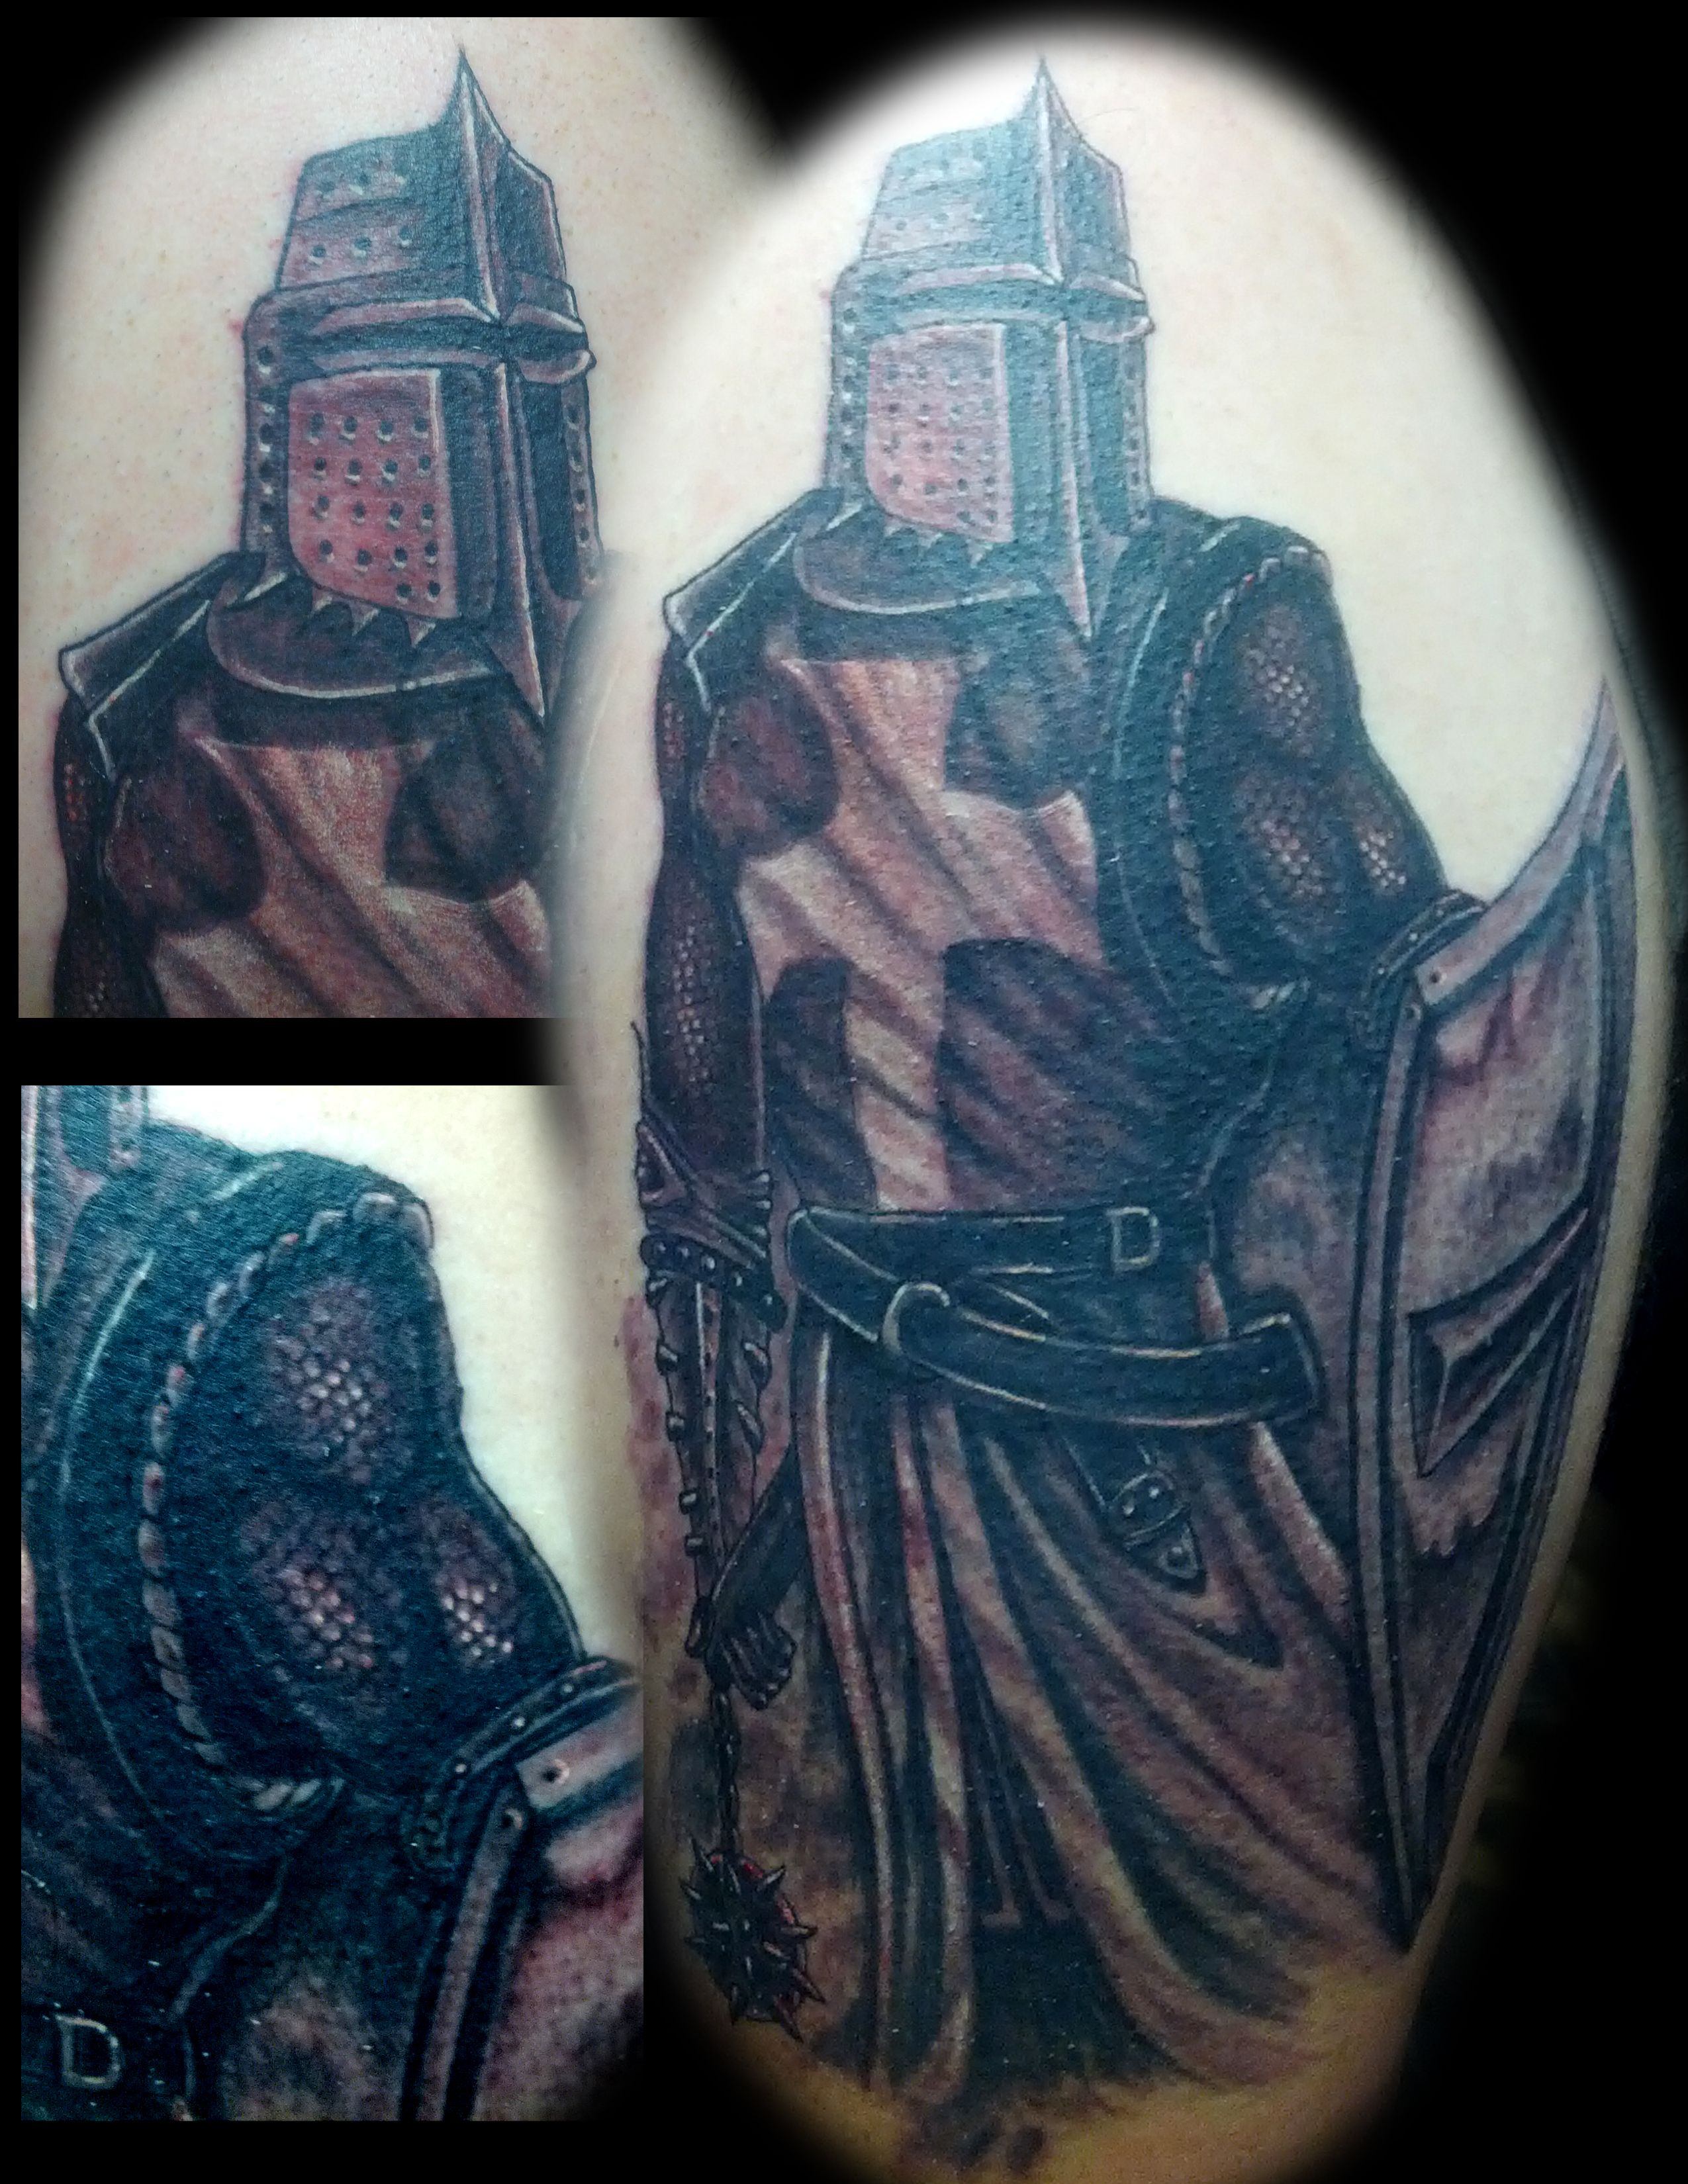 templar knight knight tattoo boneface ink ink addiction matt matts